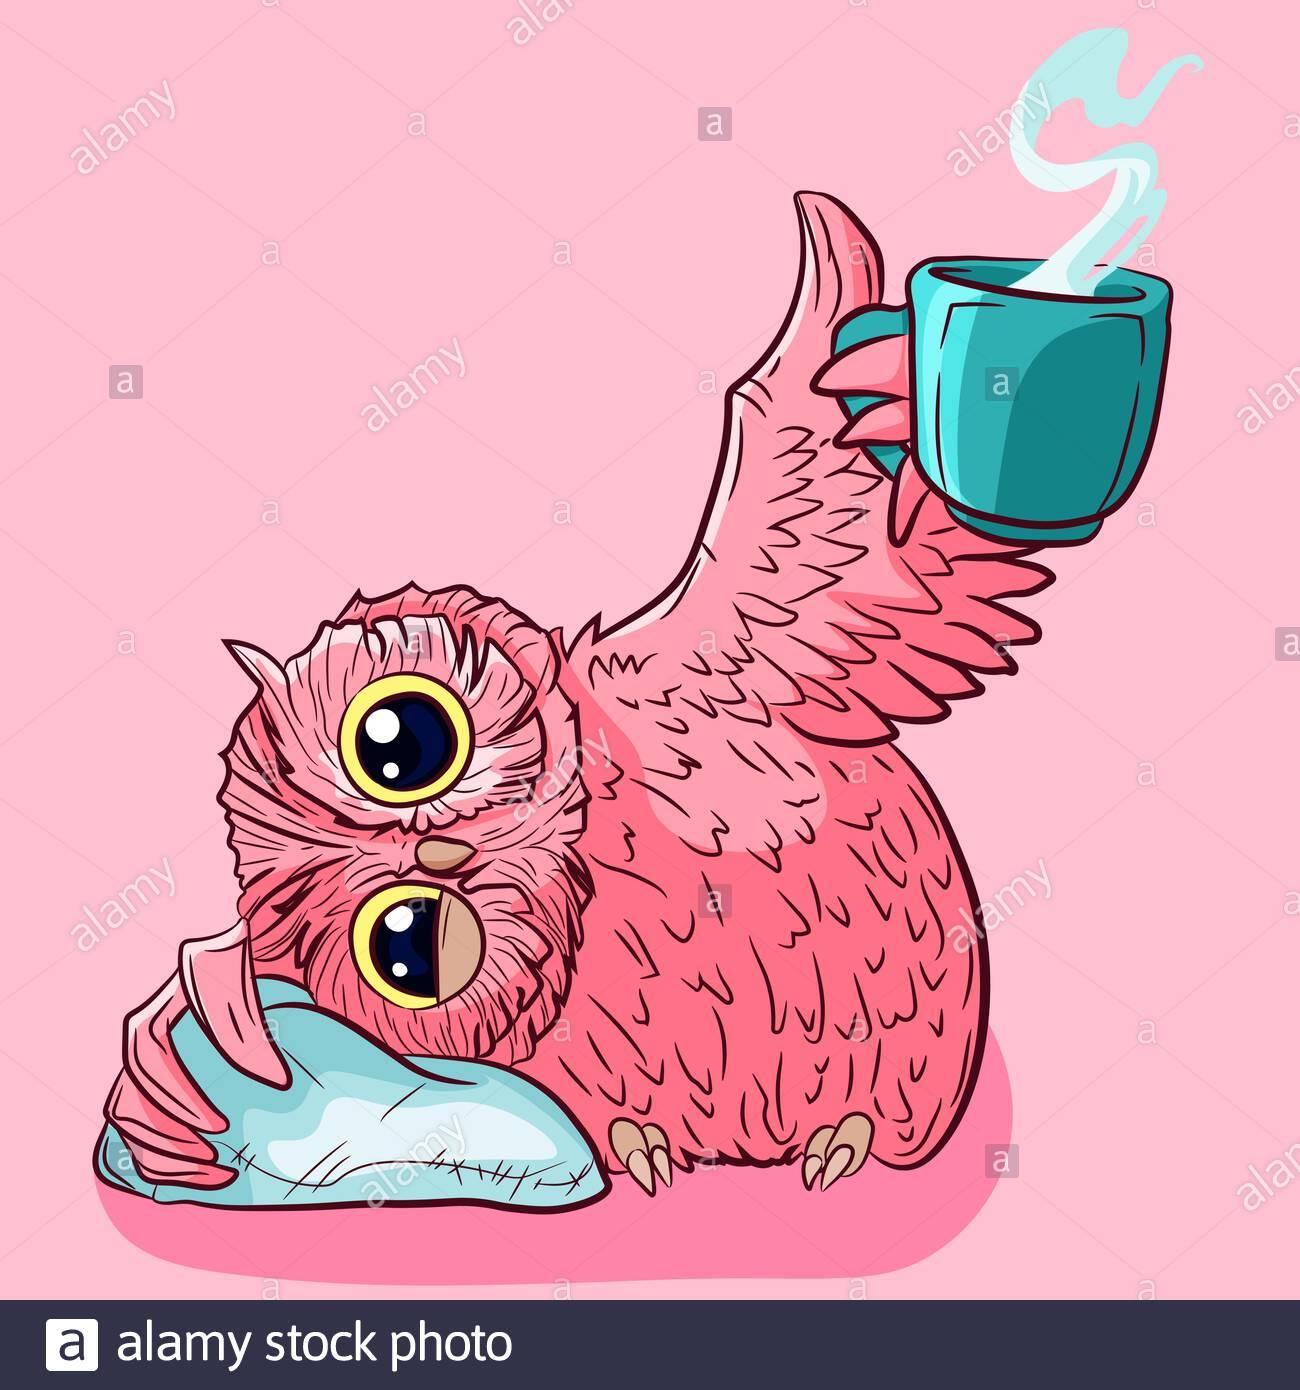 pink-sleepy-owl-drinking-his-hot-morning